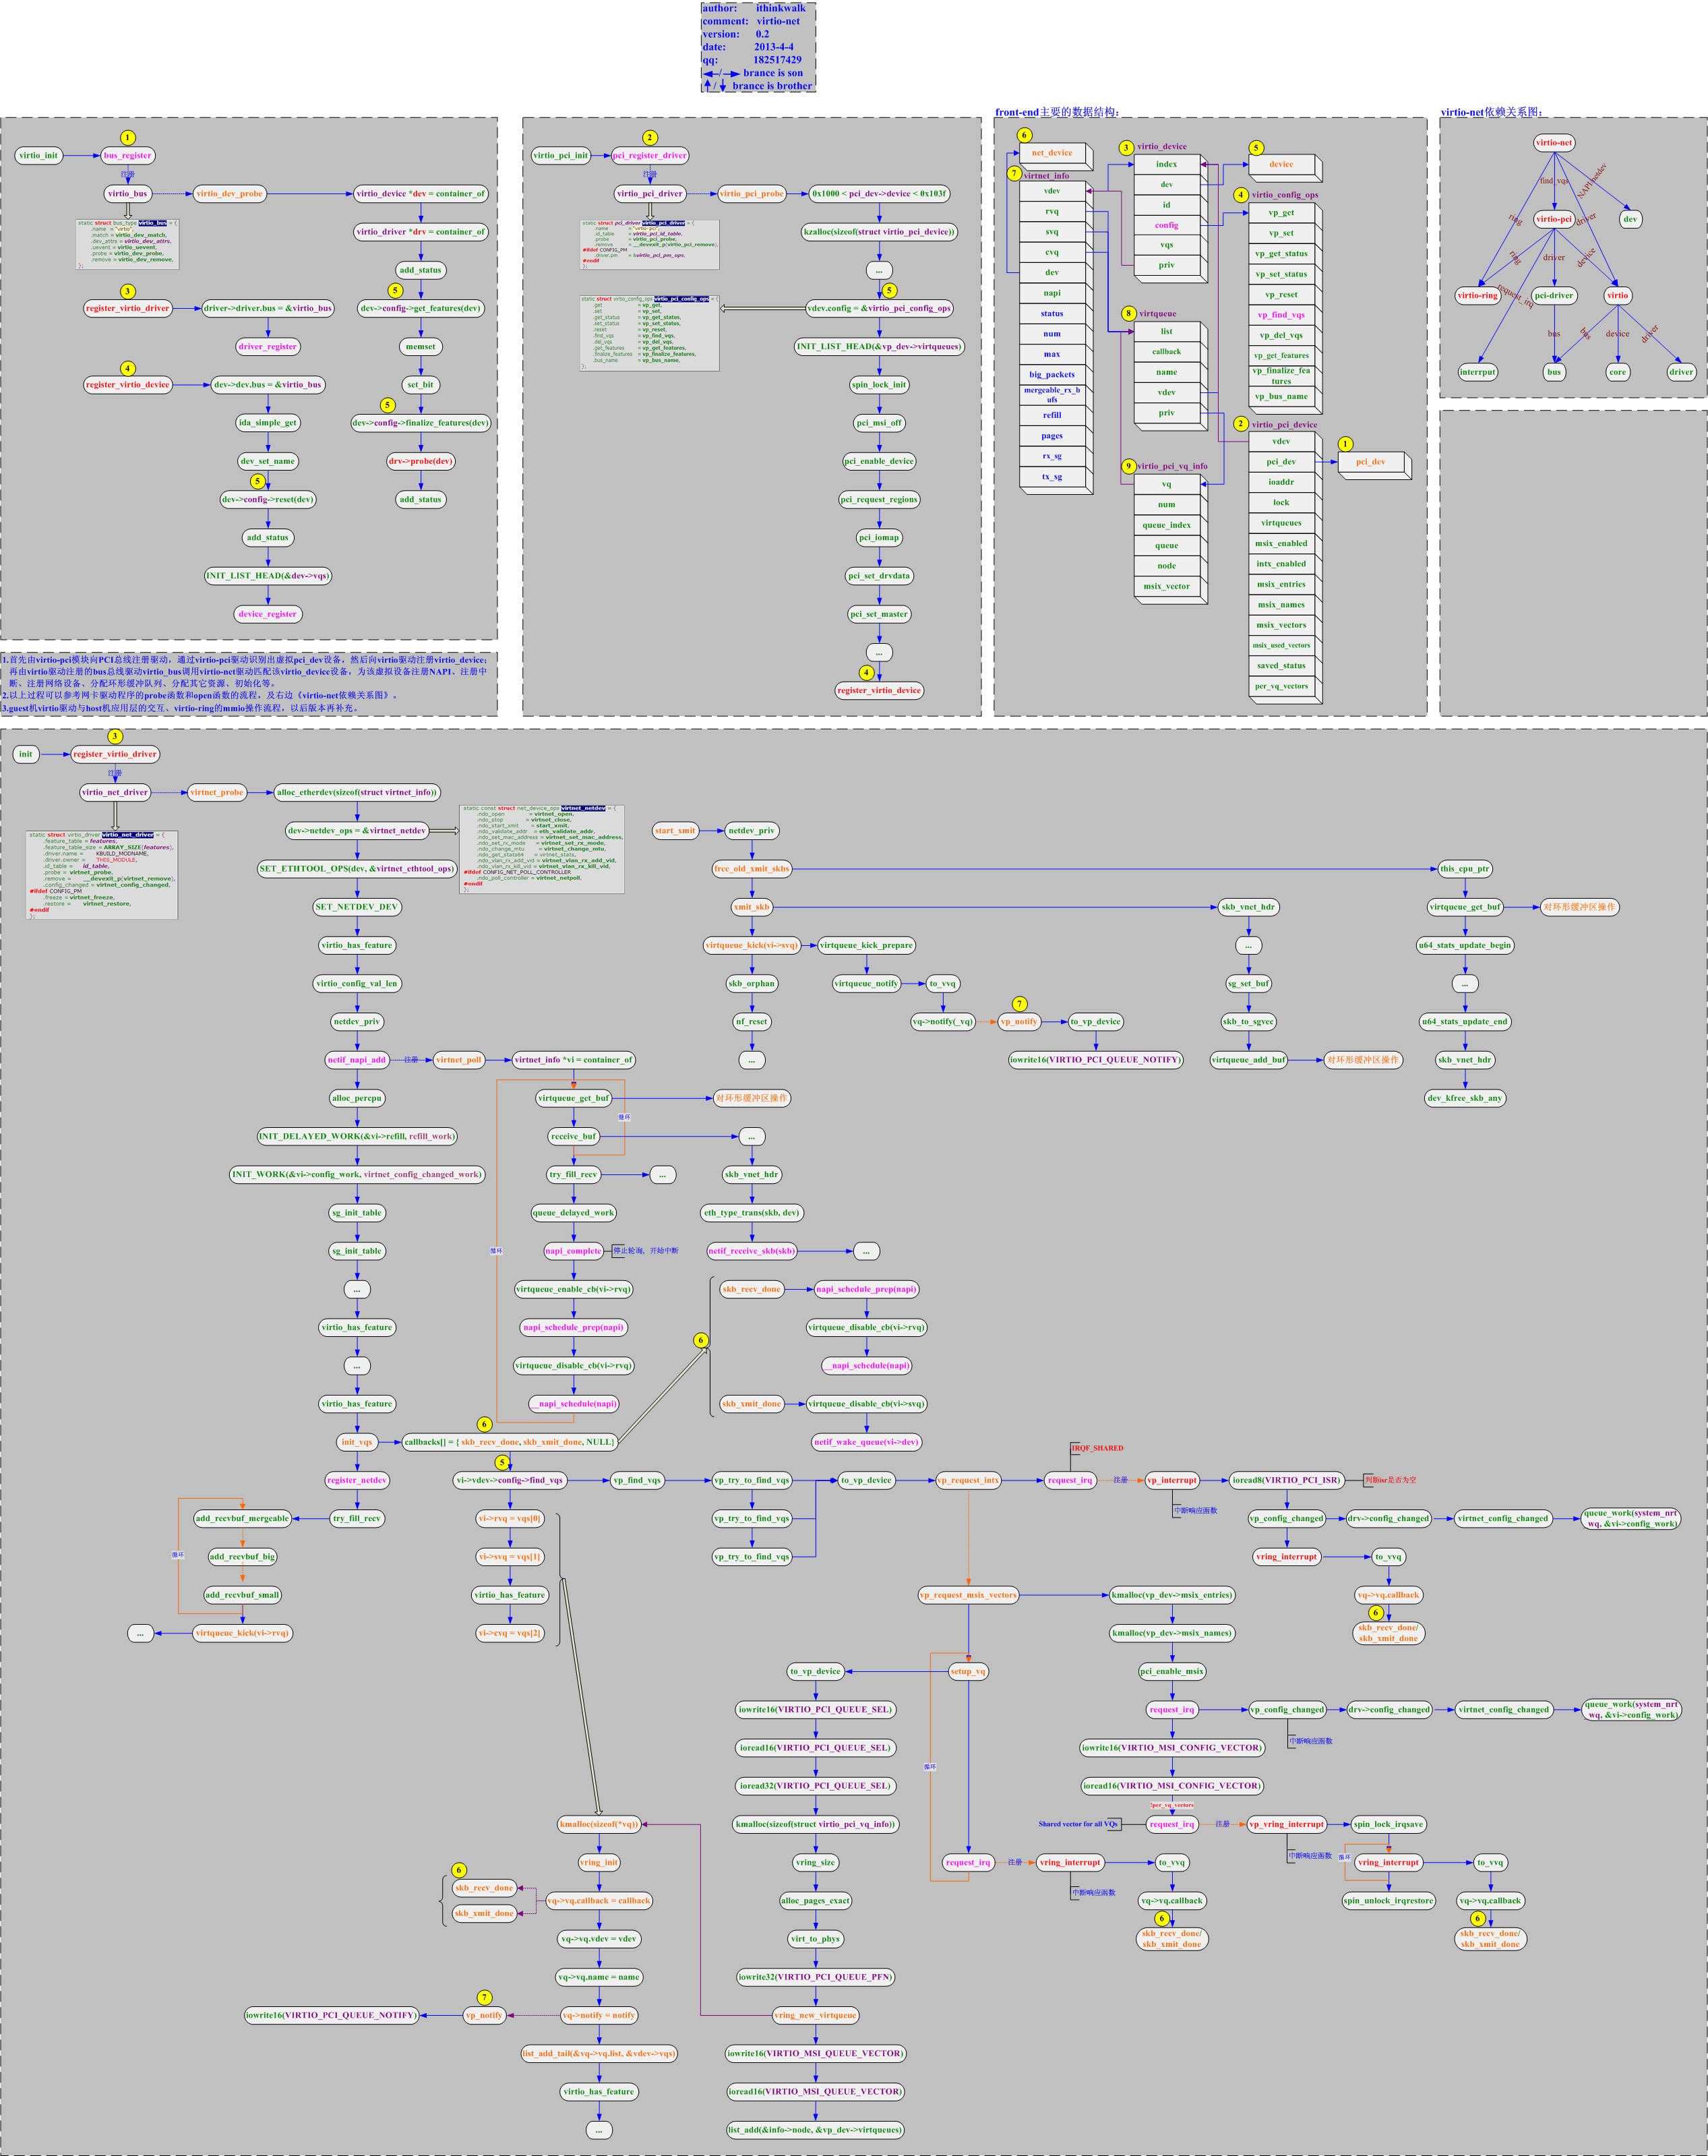 virtio-net前端驱动实现流程图.png